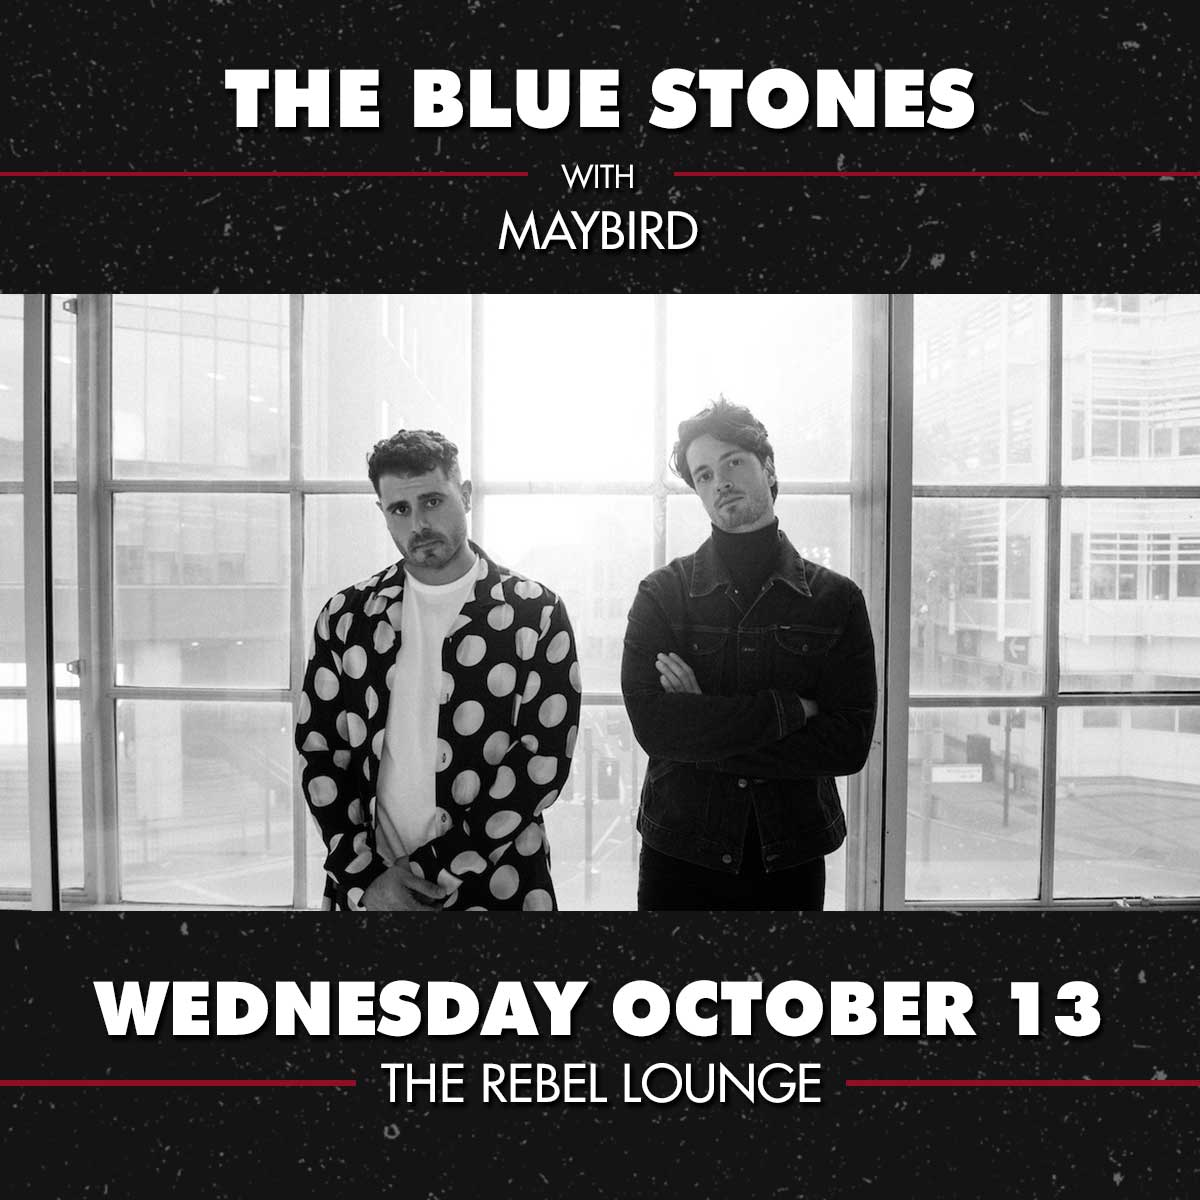 THE BLUE STONES: